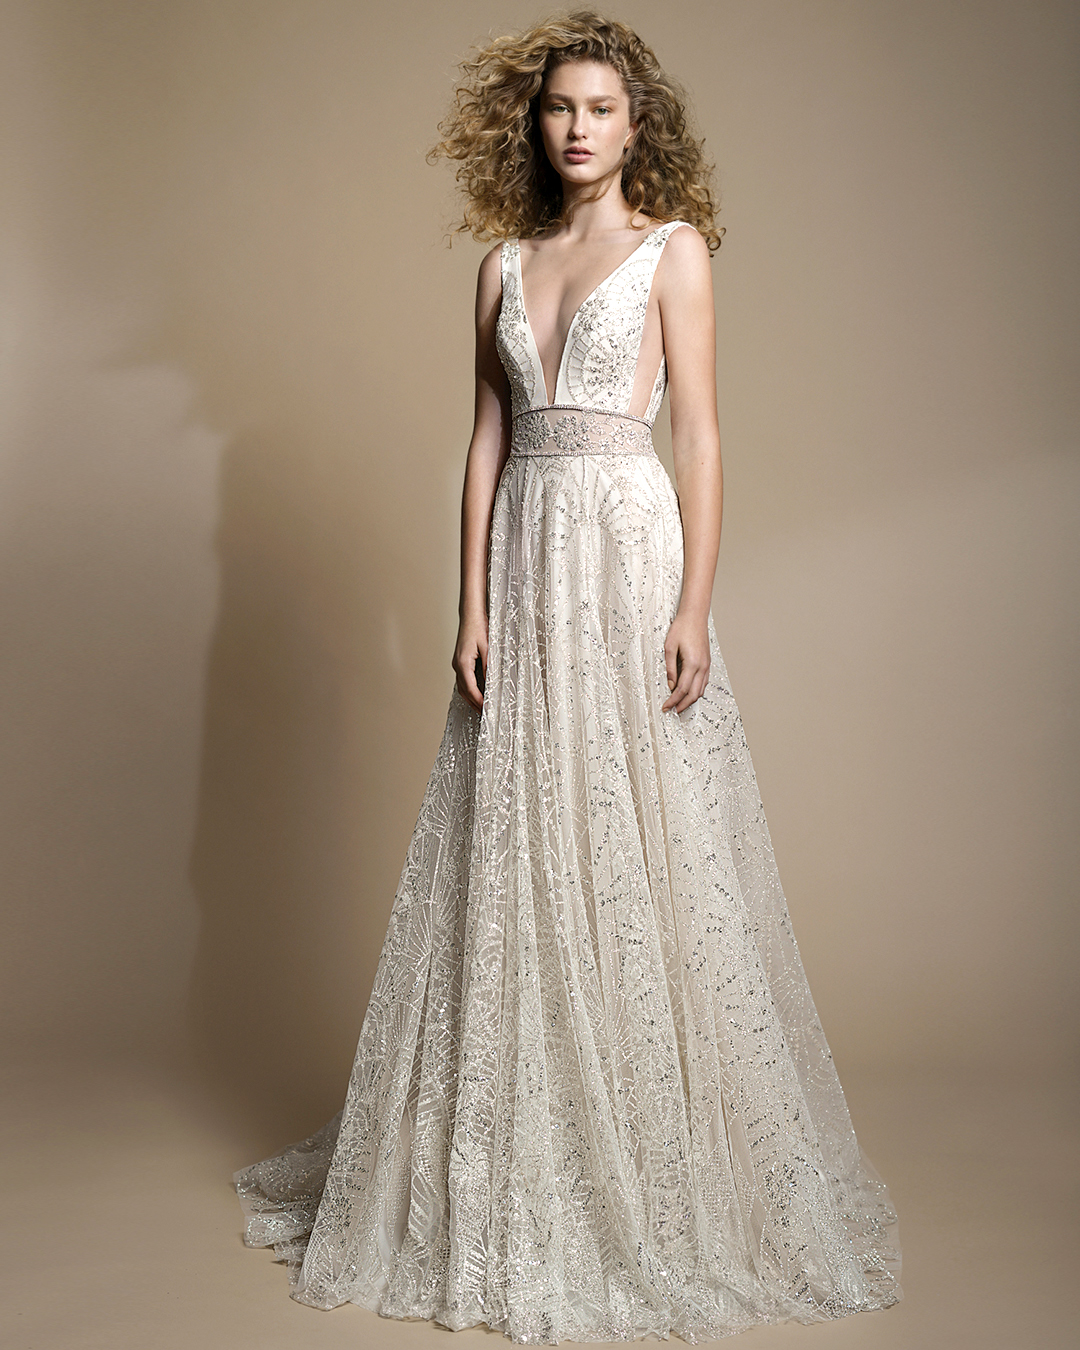 galia lahav gala wedding dress spring 2019 v-neck sparkly a-line